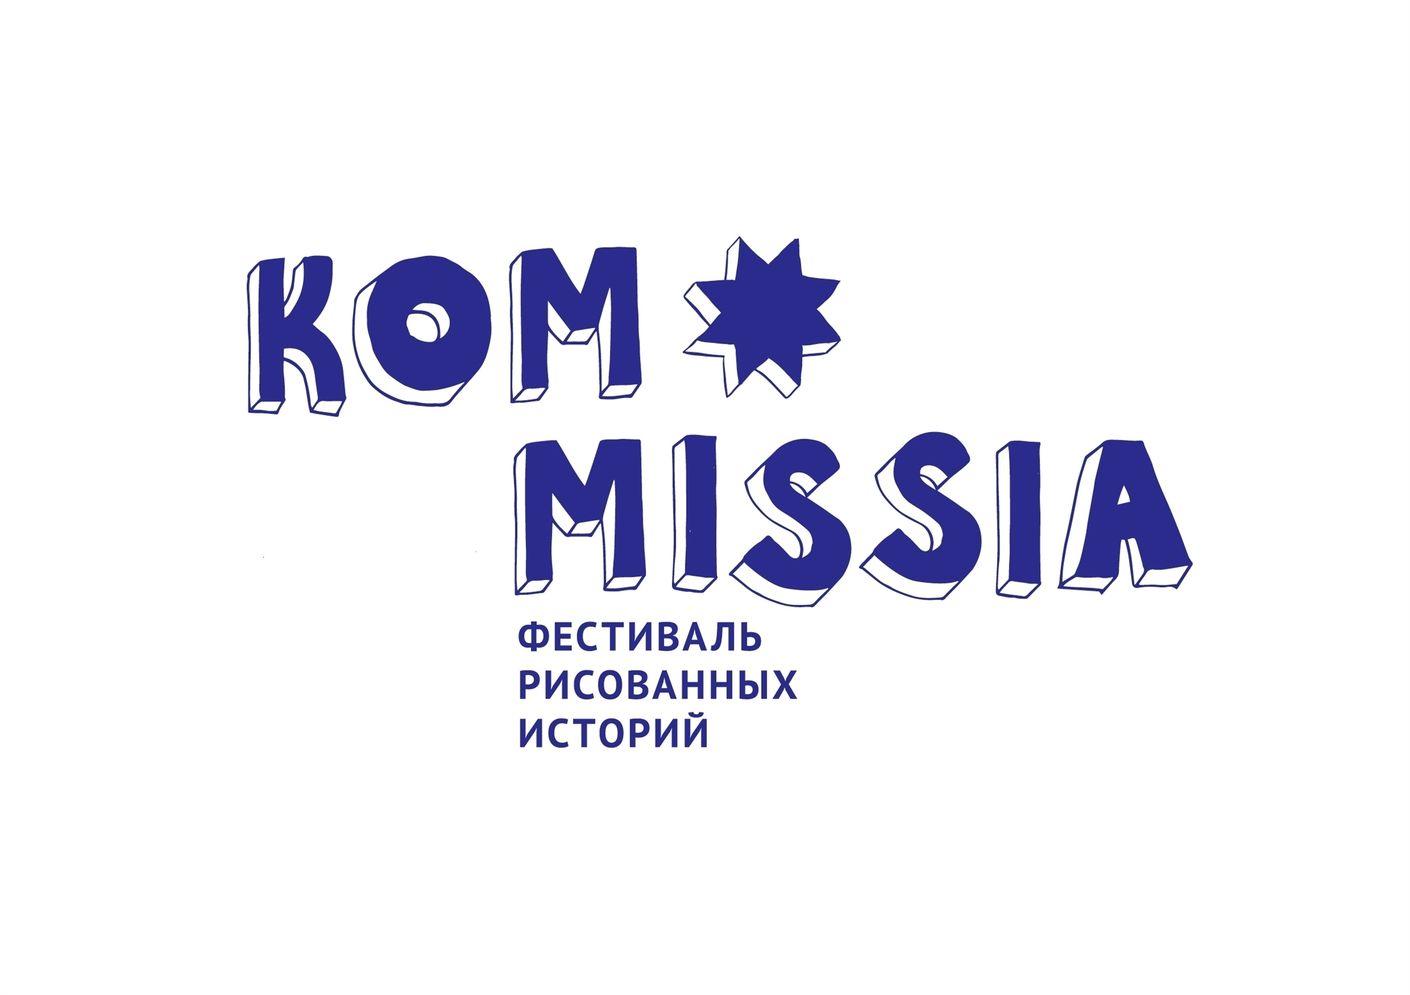 Айдентика фестиваля Kommissia. Лаборатория дизайна НИУ ВШЭ - hsedesignlab.ru